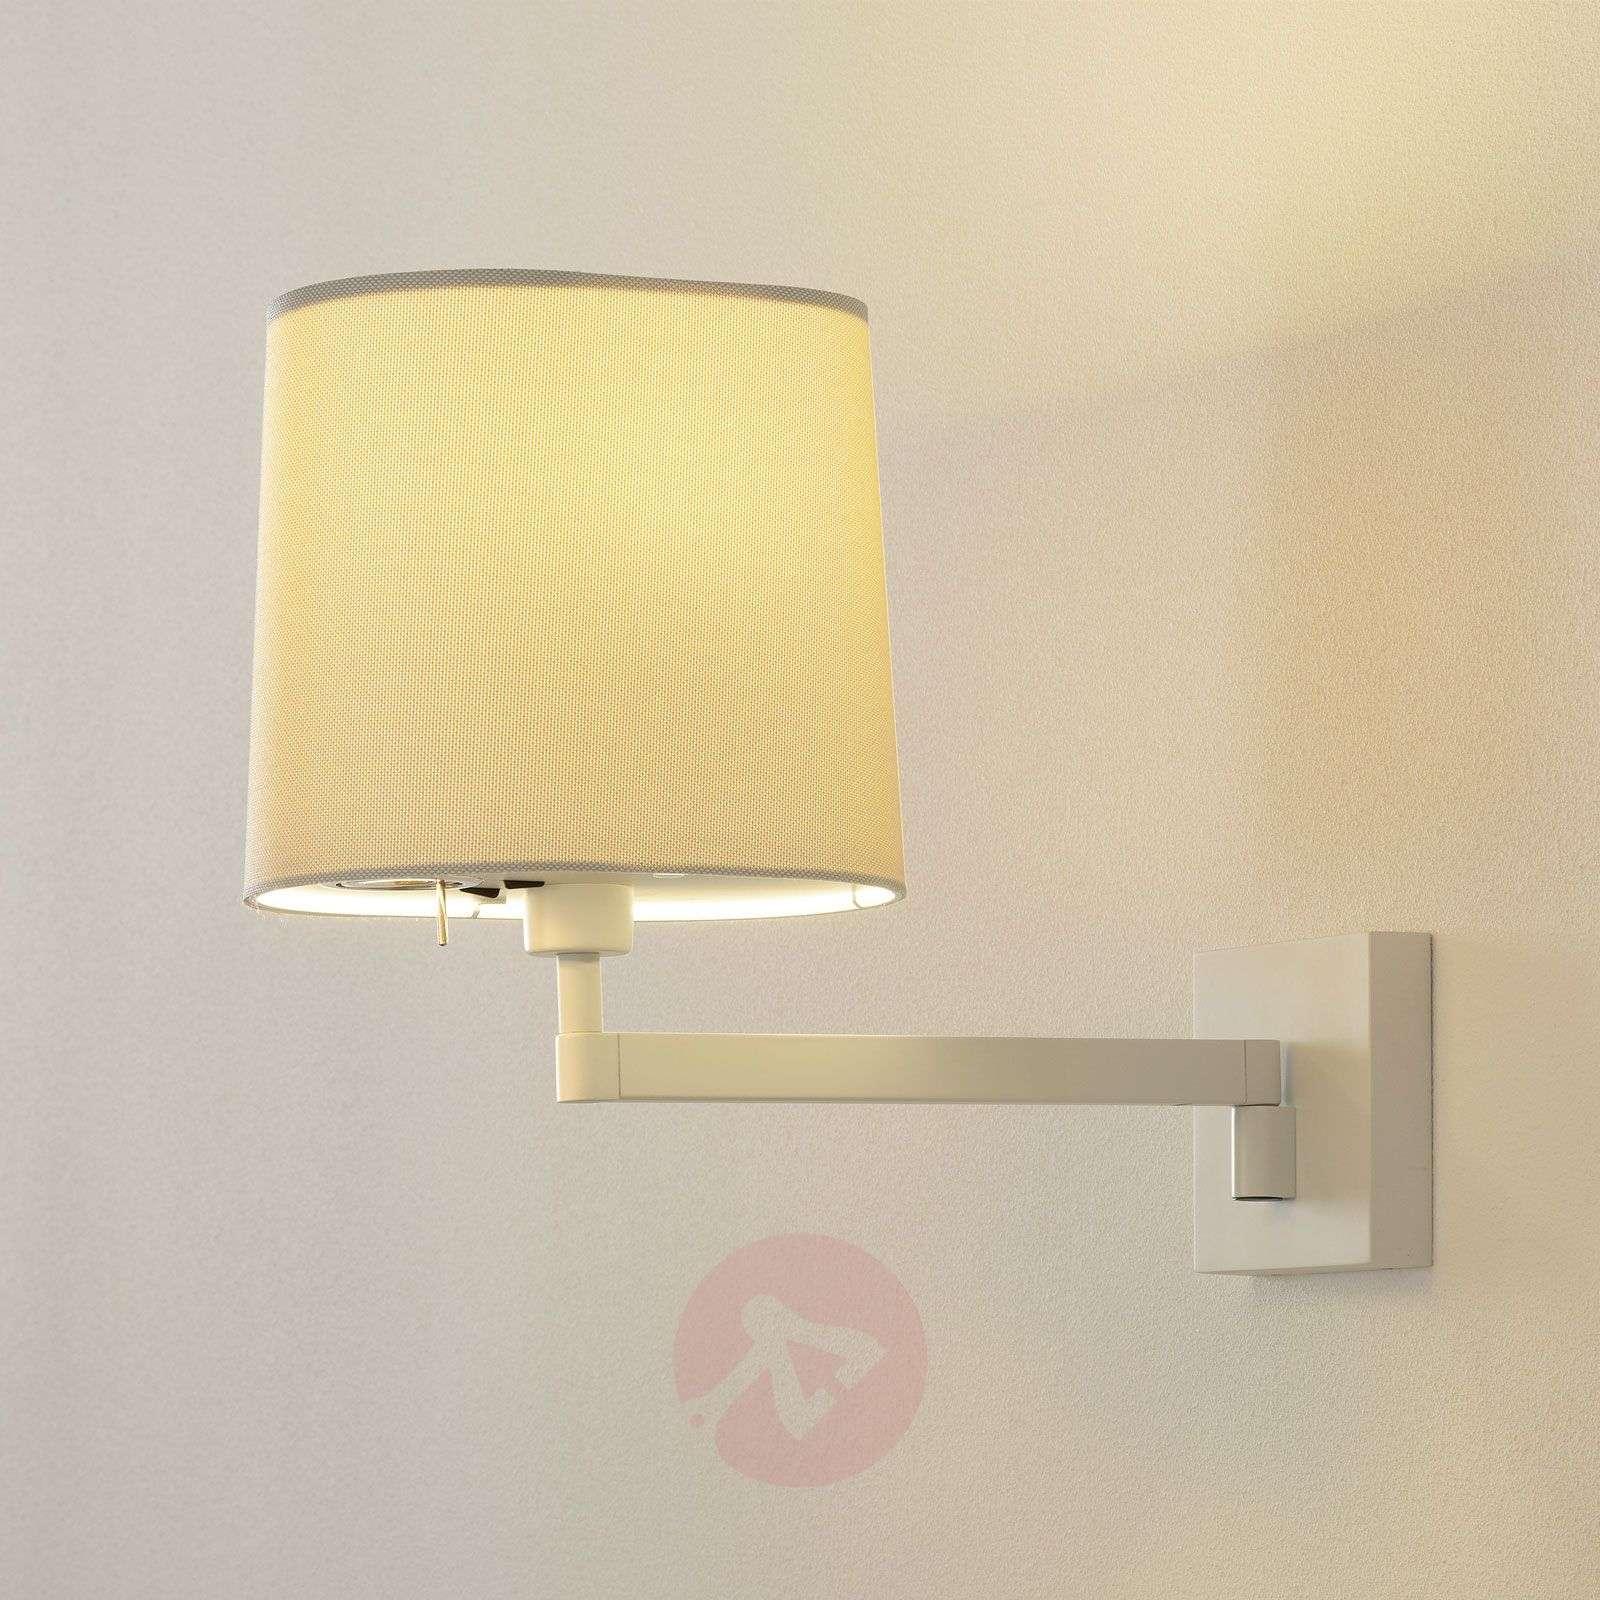 Vibia Swing – seinävalaisin, jossa integroitu LED-9515081-01